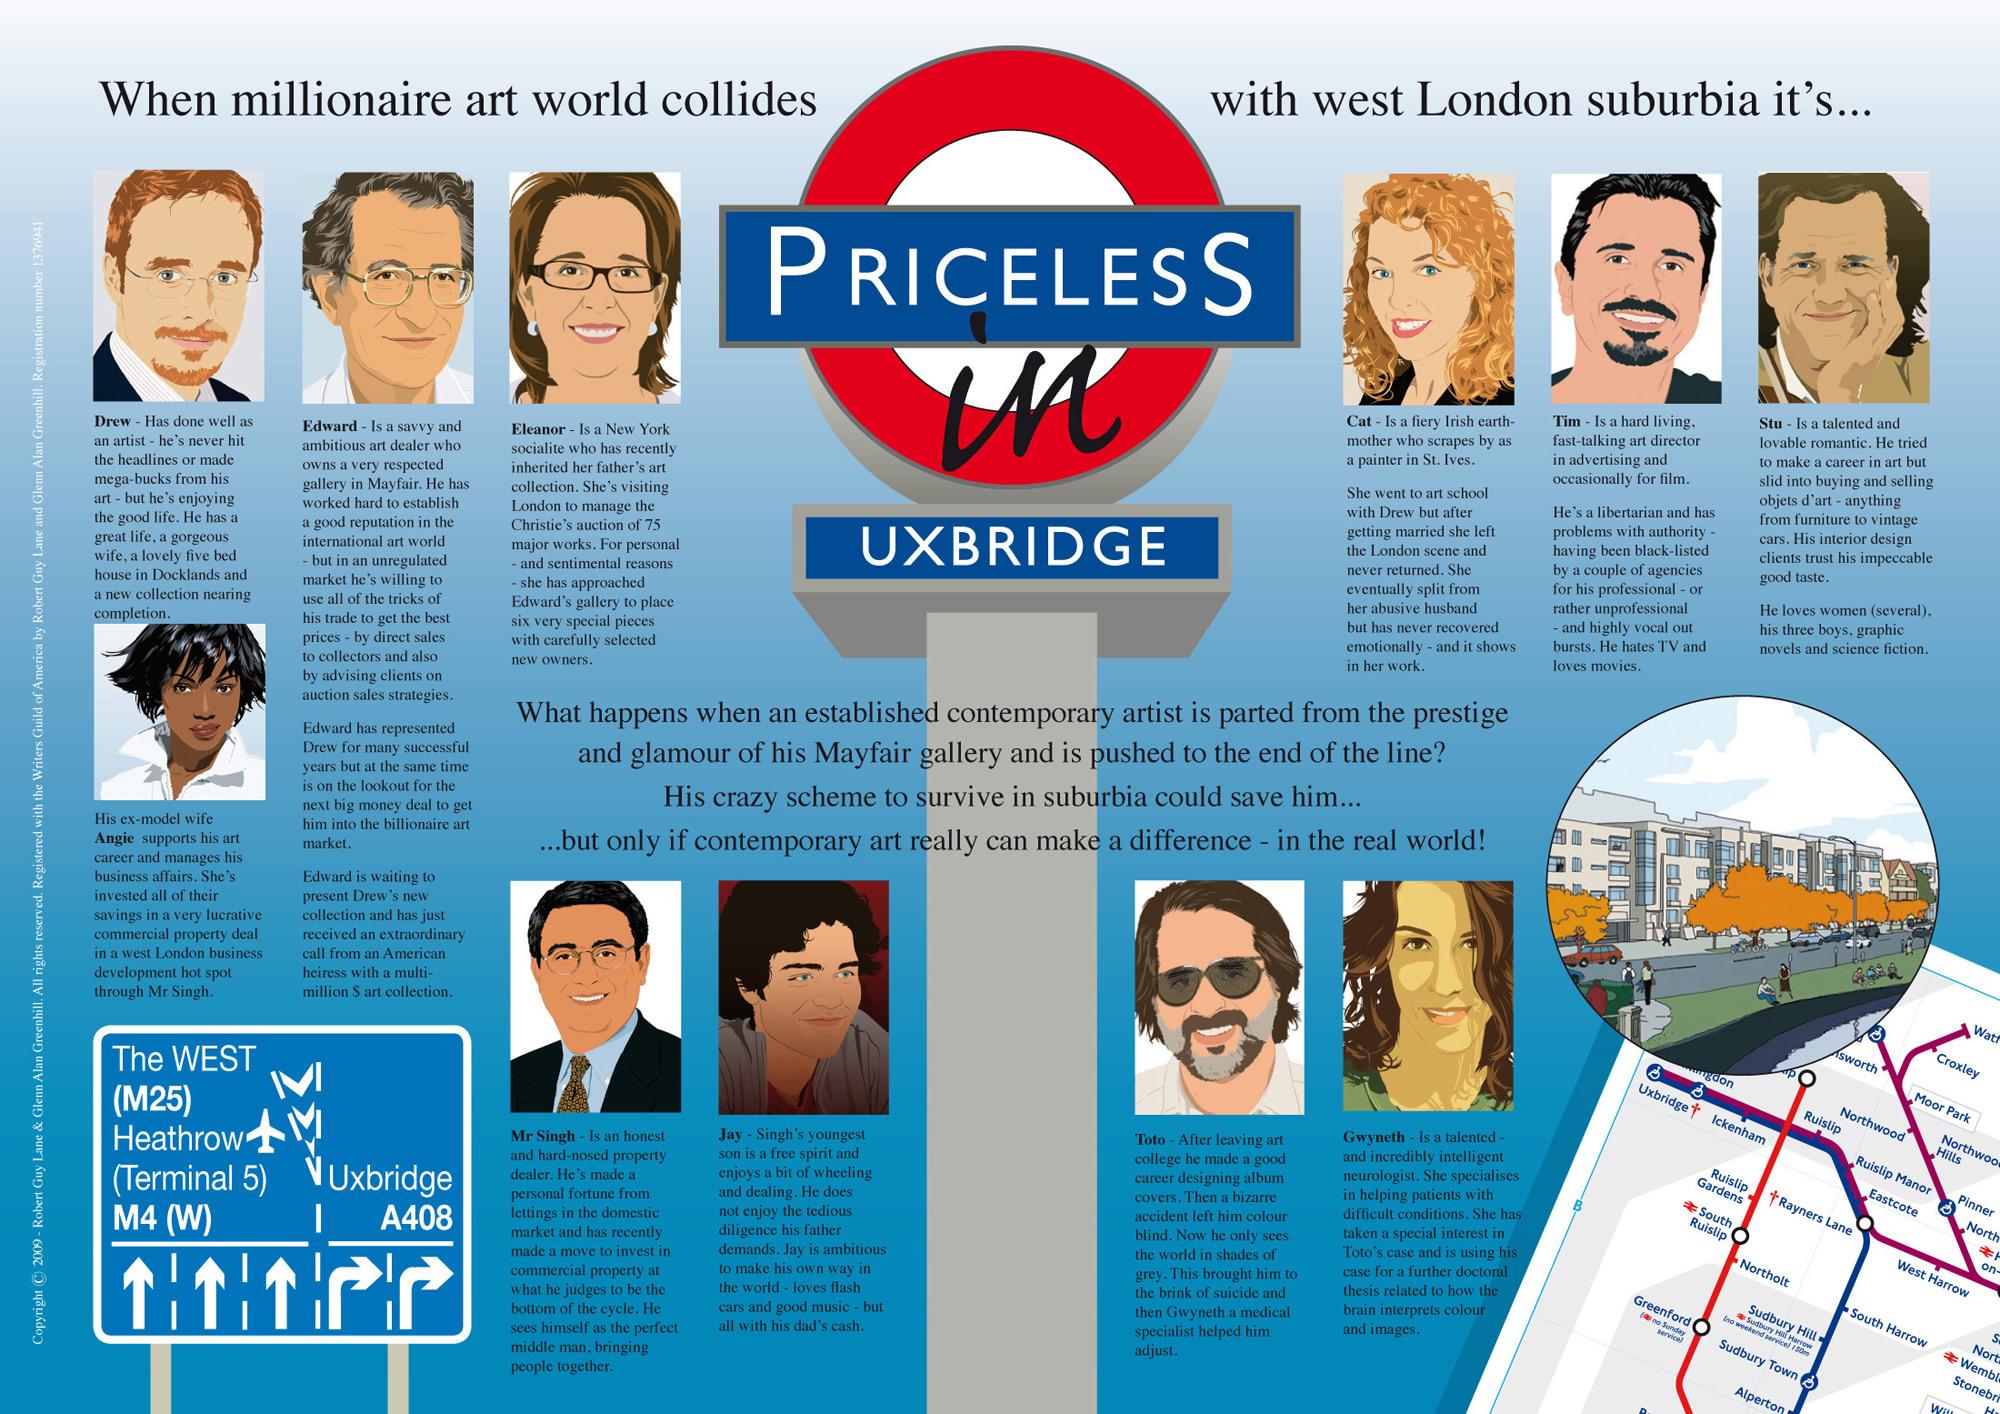 priceless_in_uxbridge_02b